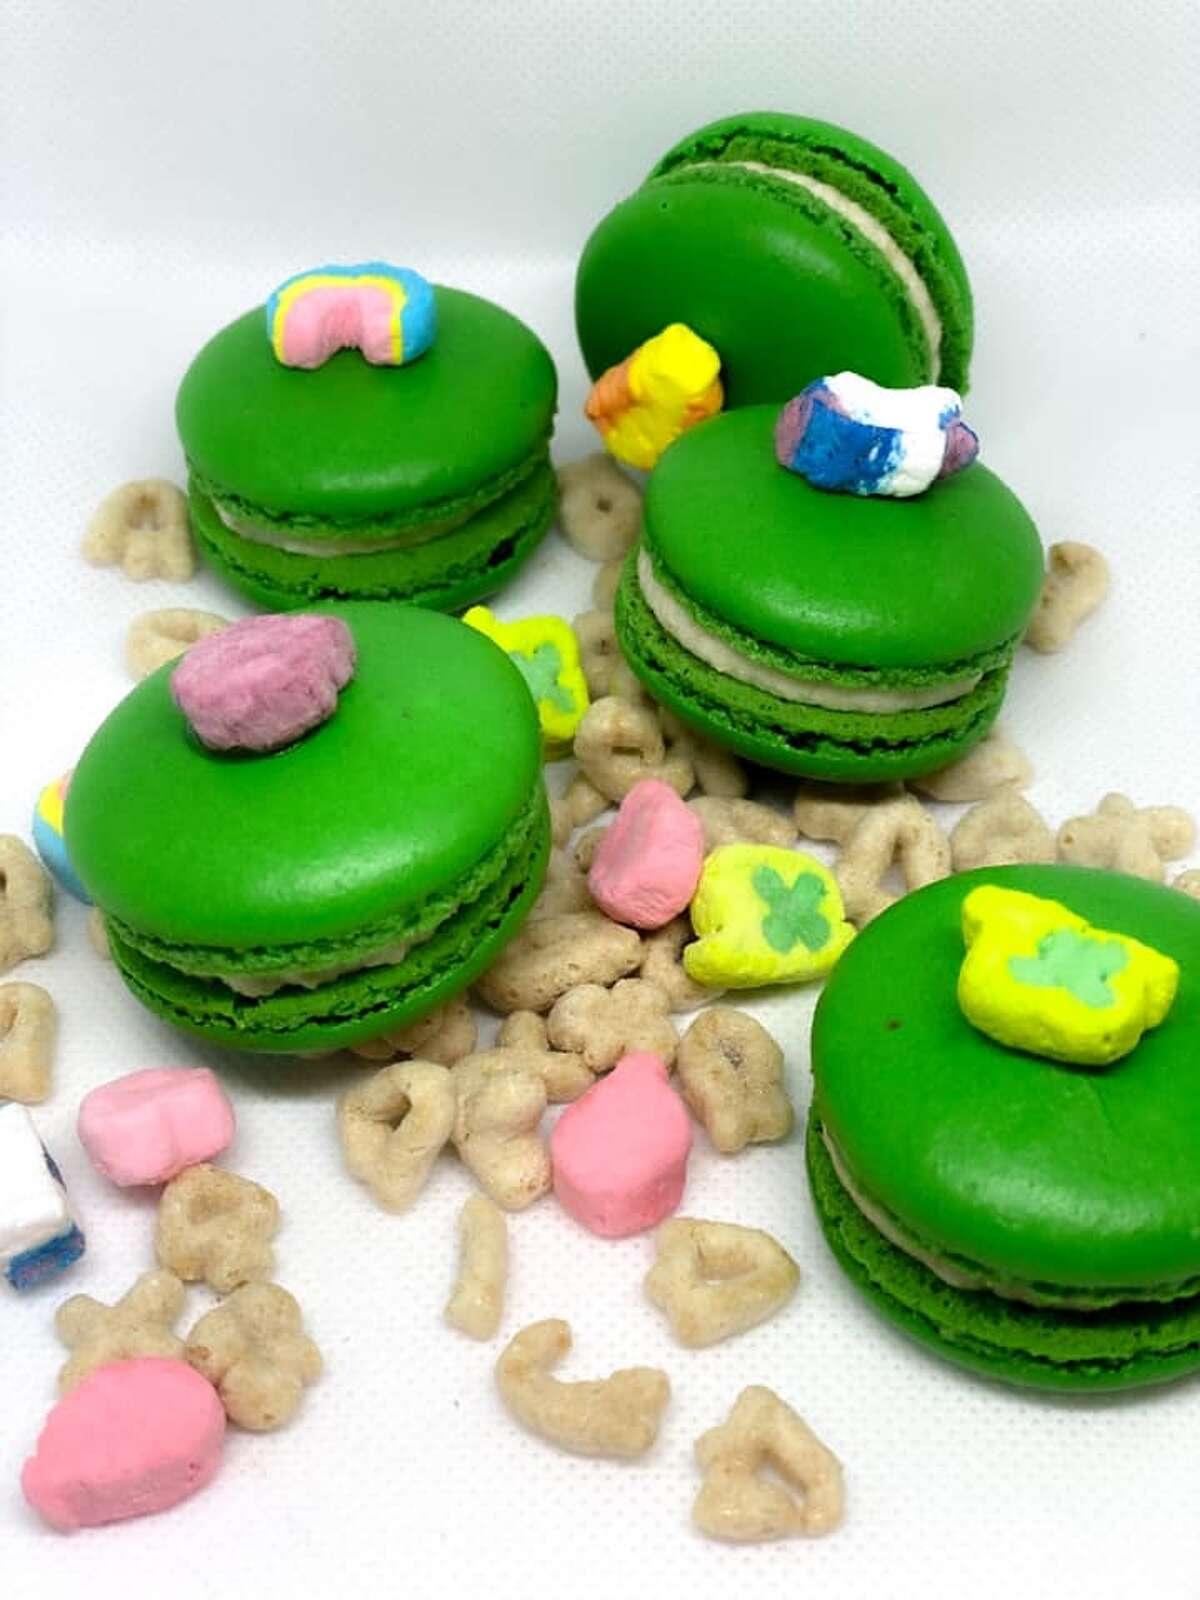 Brittney's Macarons